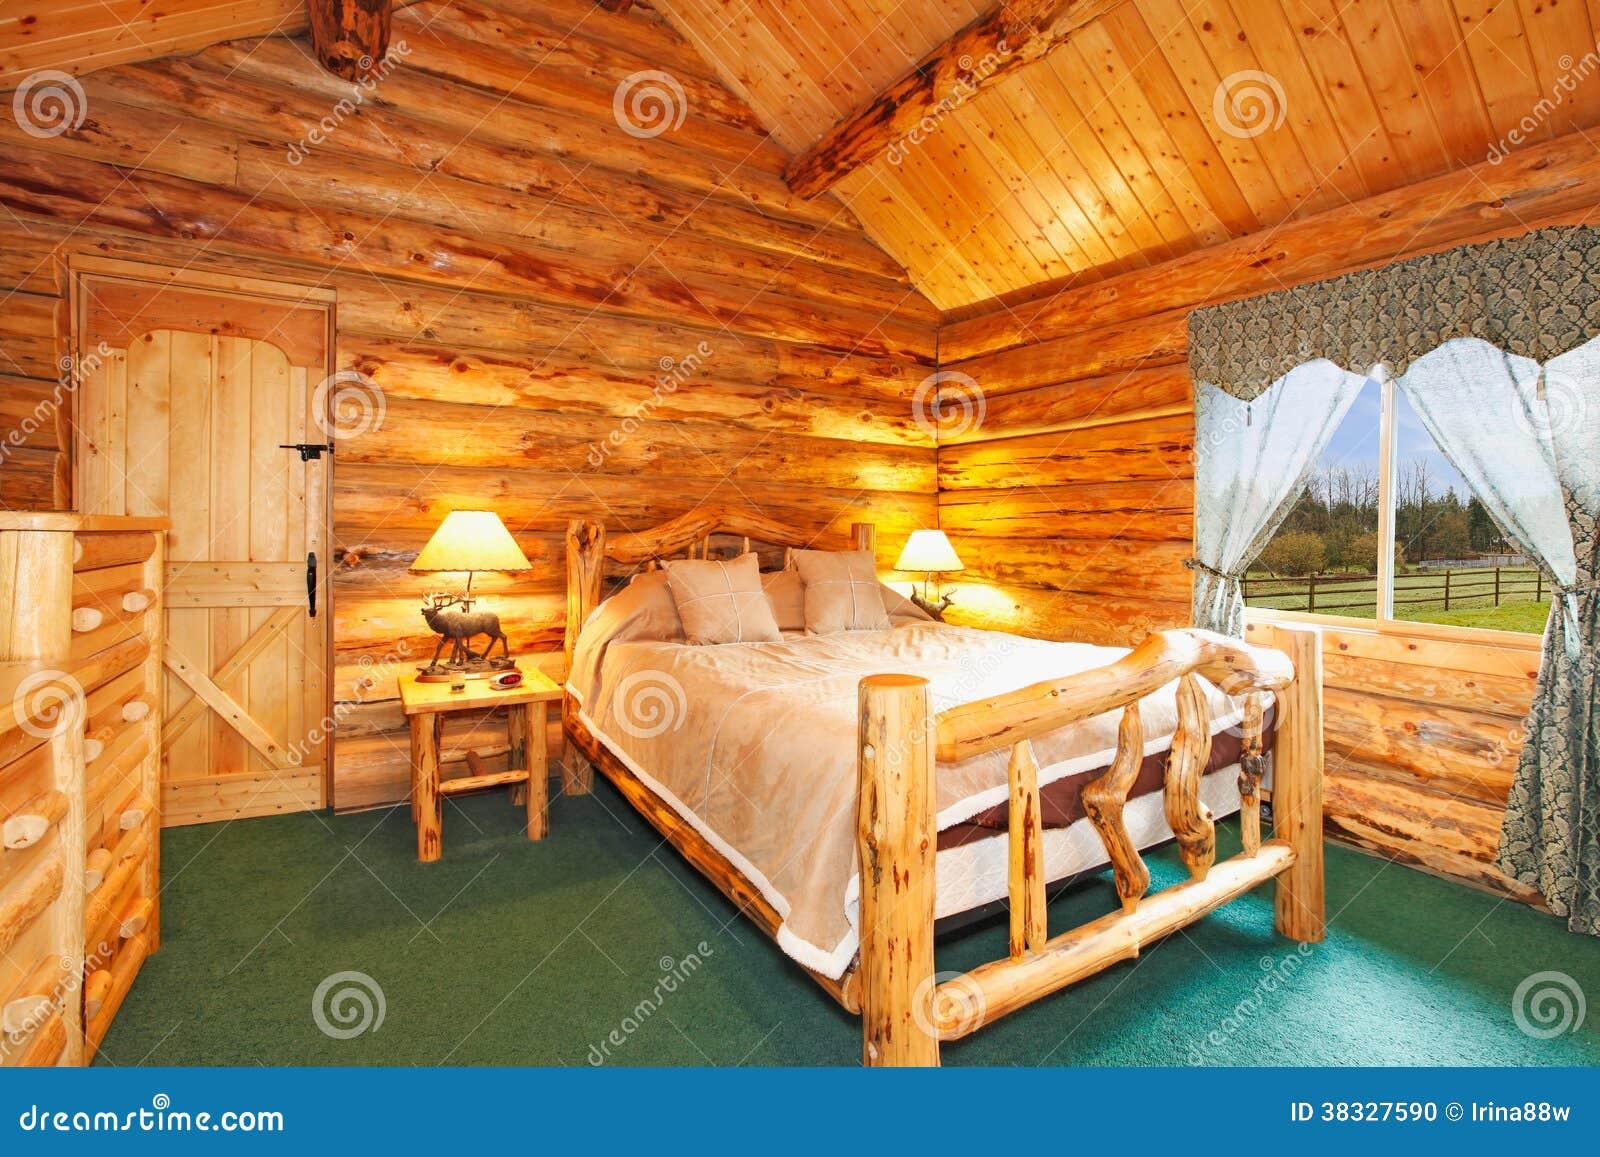 Cozy Bedroom In Log Cabin House Stock Photo Image 38327590